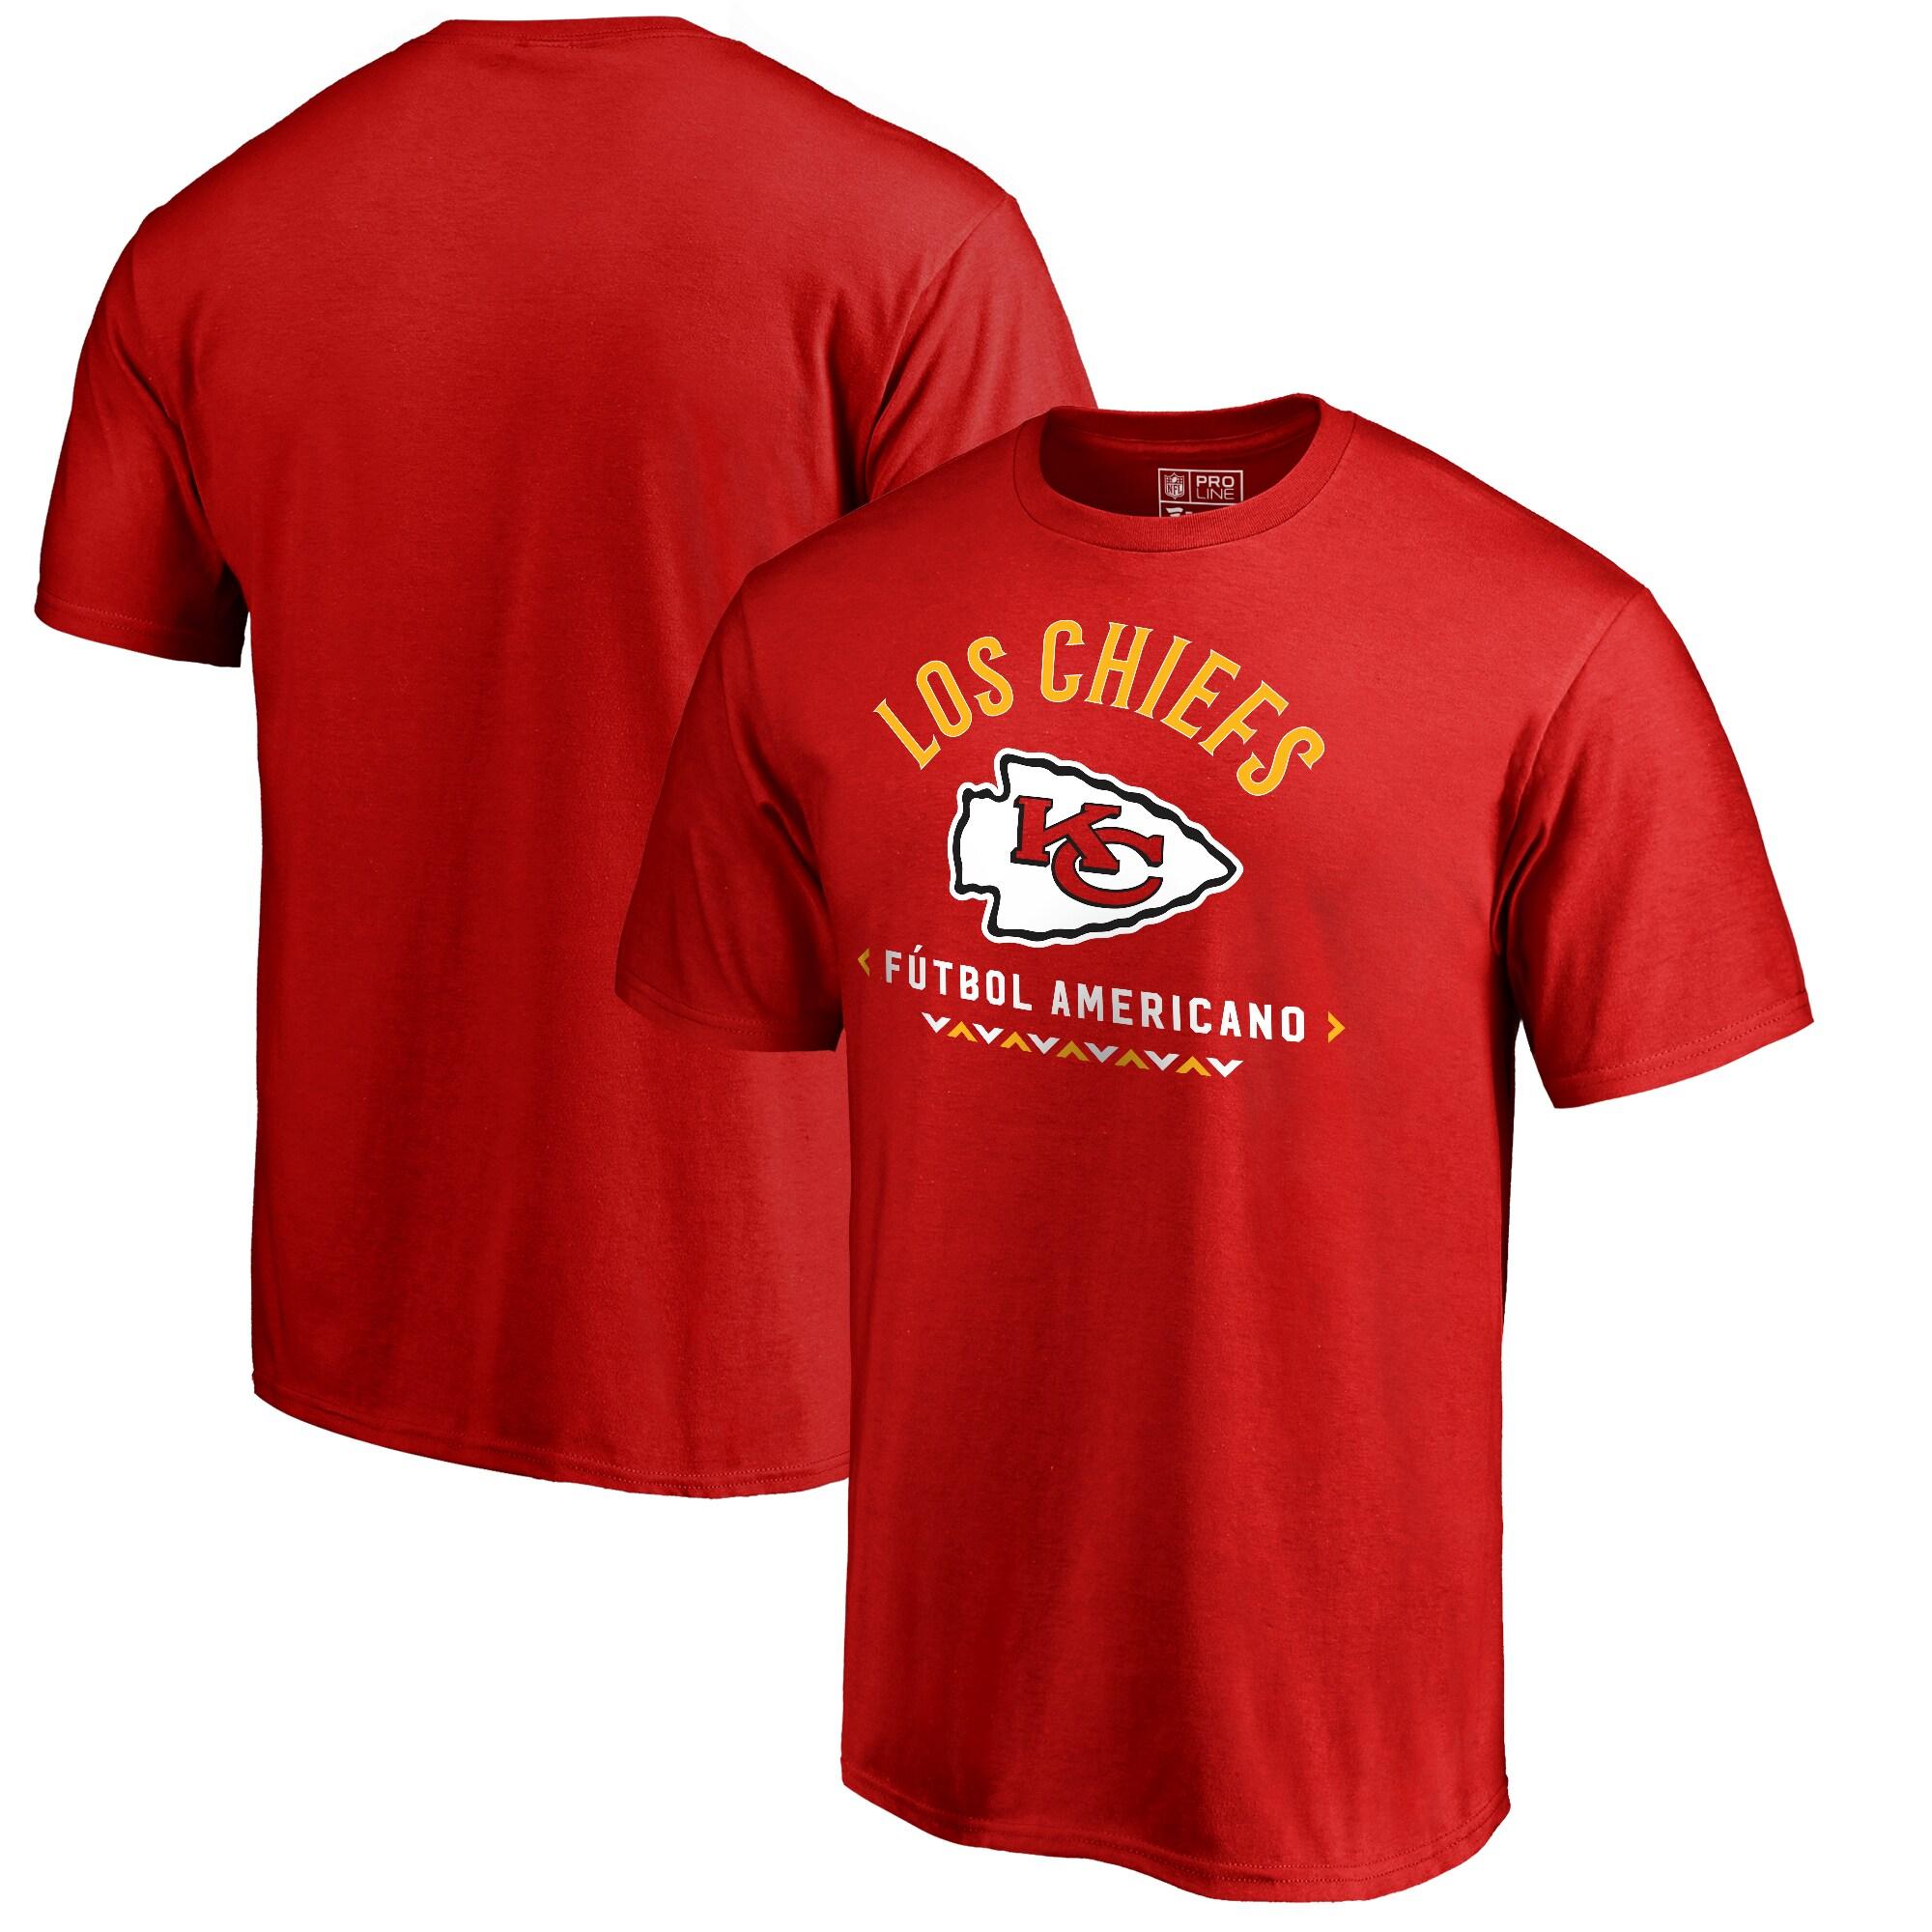 Kansas City Chiefs NFL Pro Line by Fanatics Branded Futbol Americano T-Shirt - Red